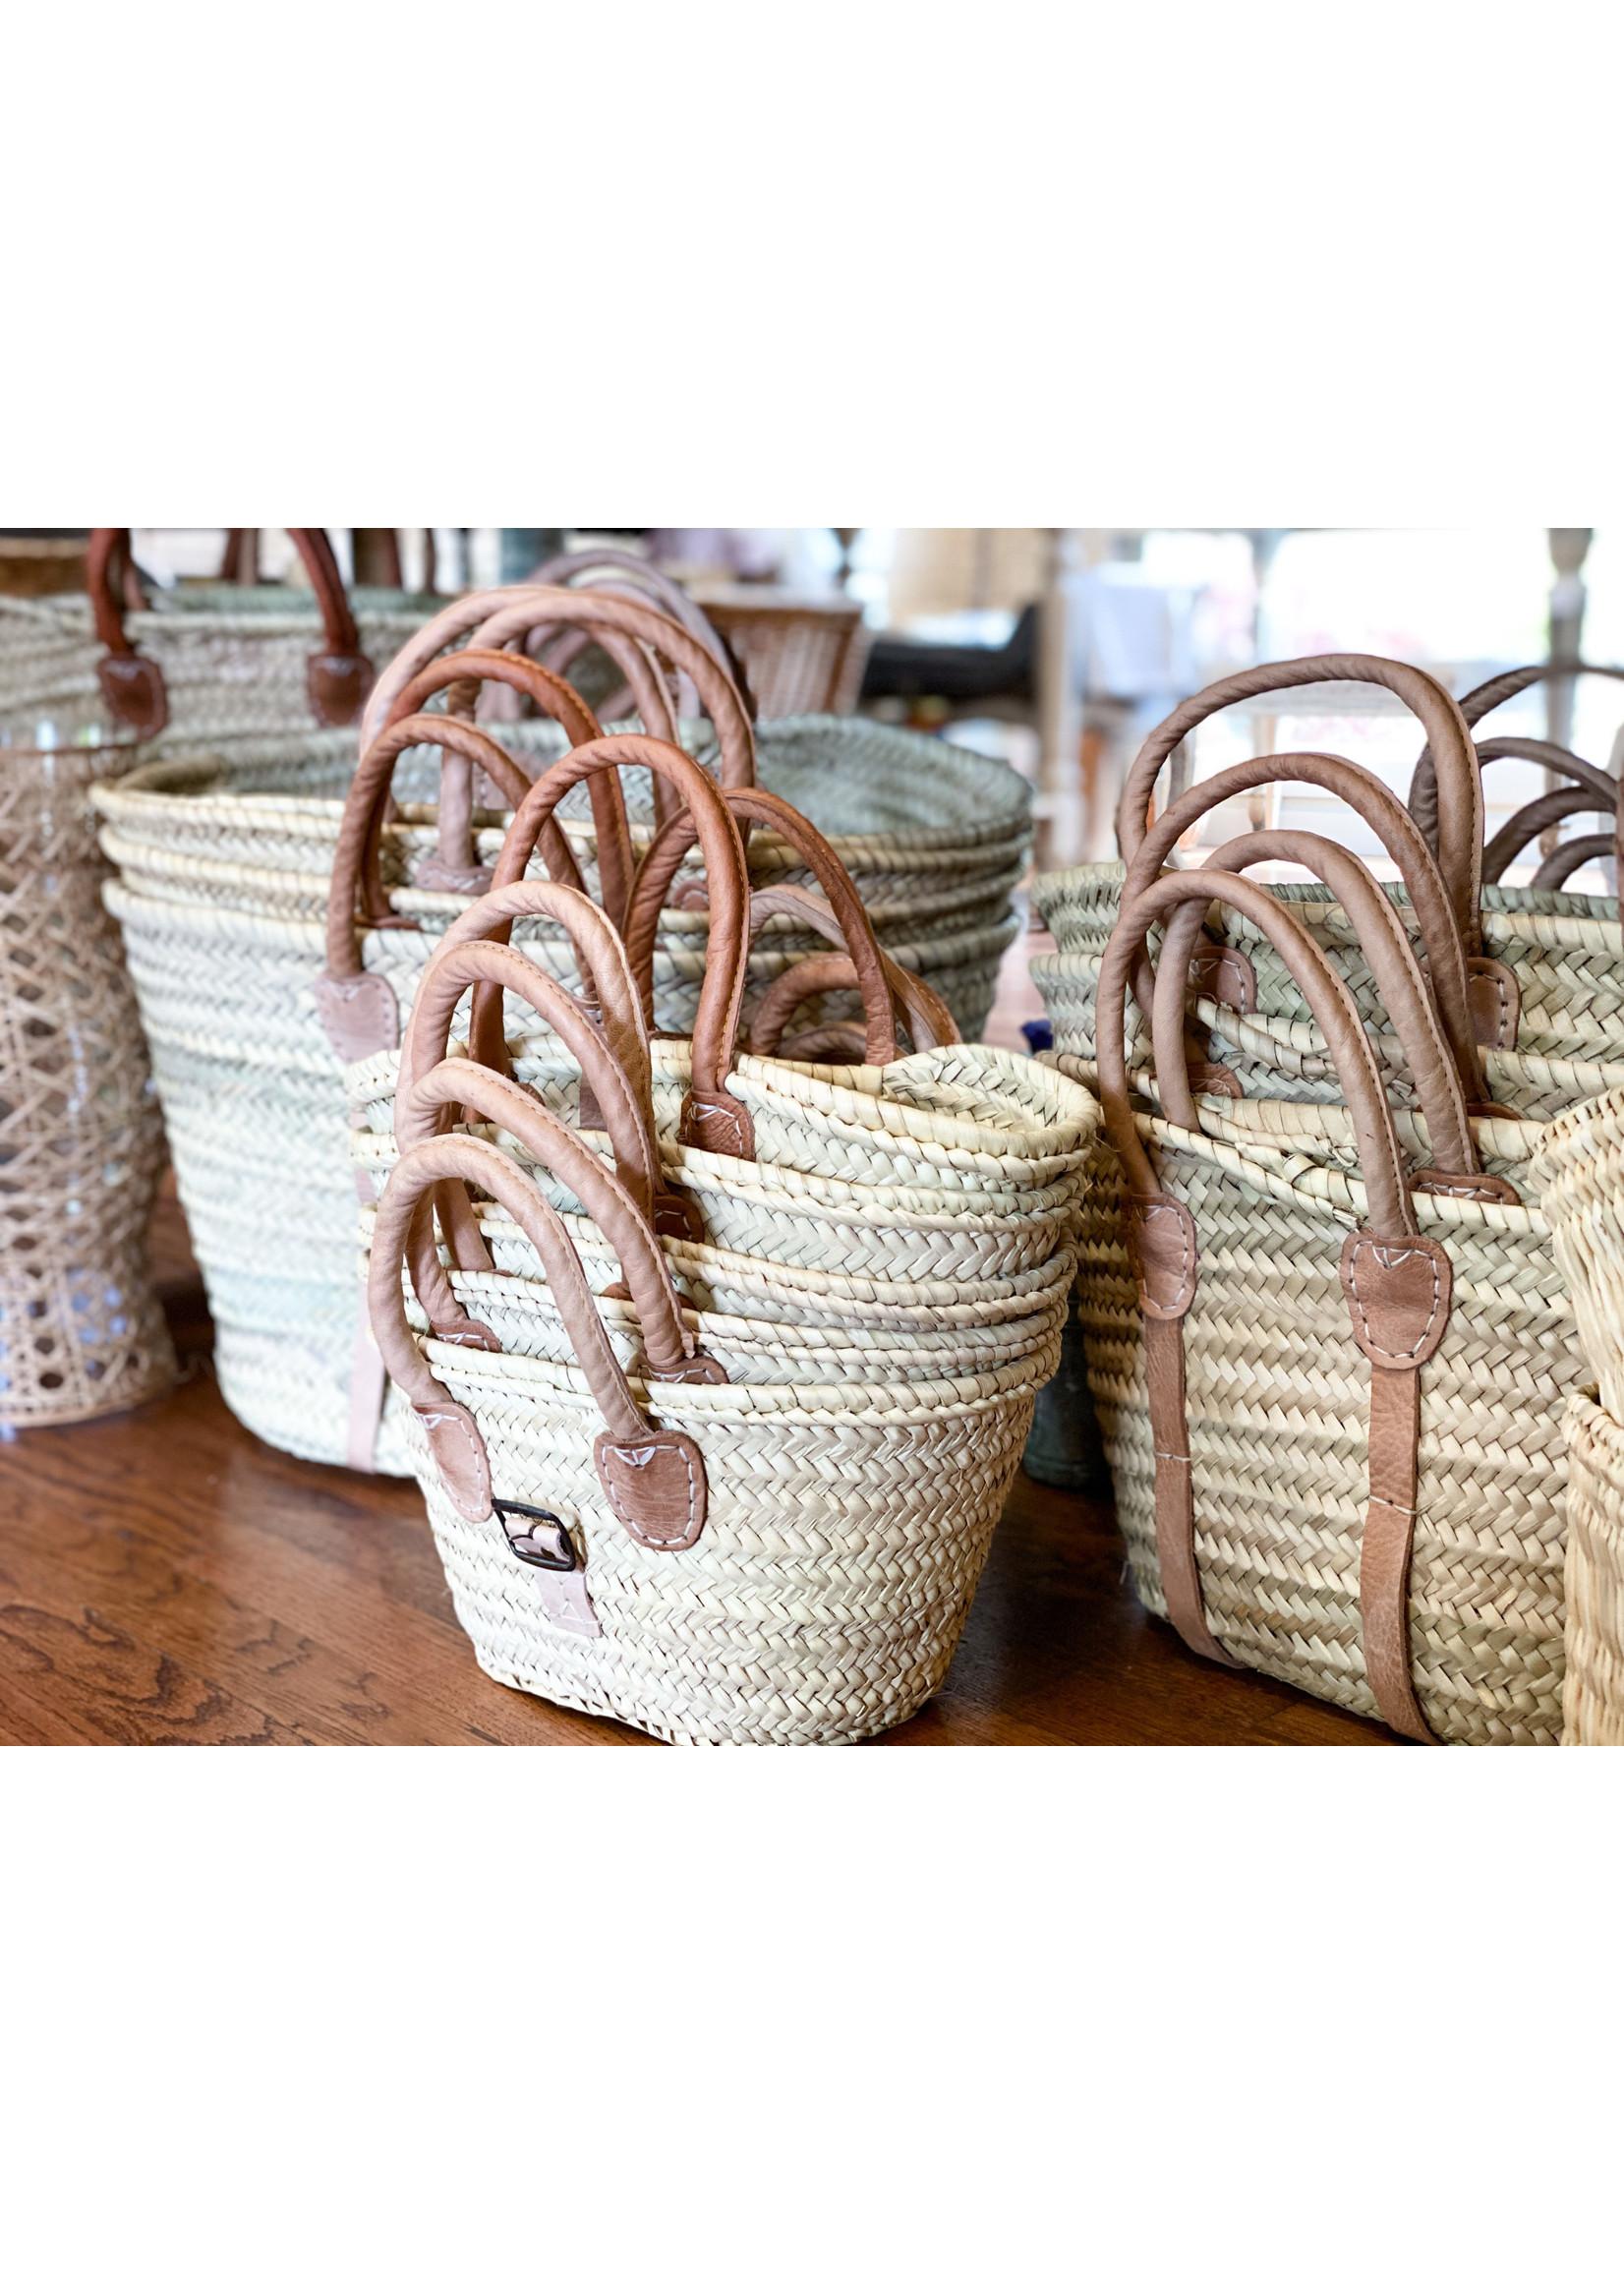 French Market Tote - Pico Bag